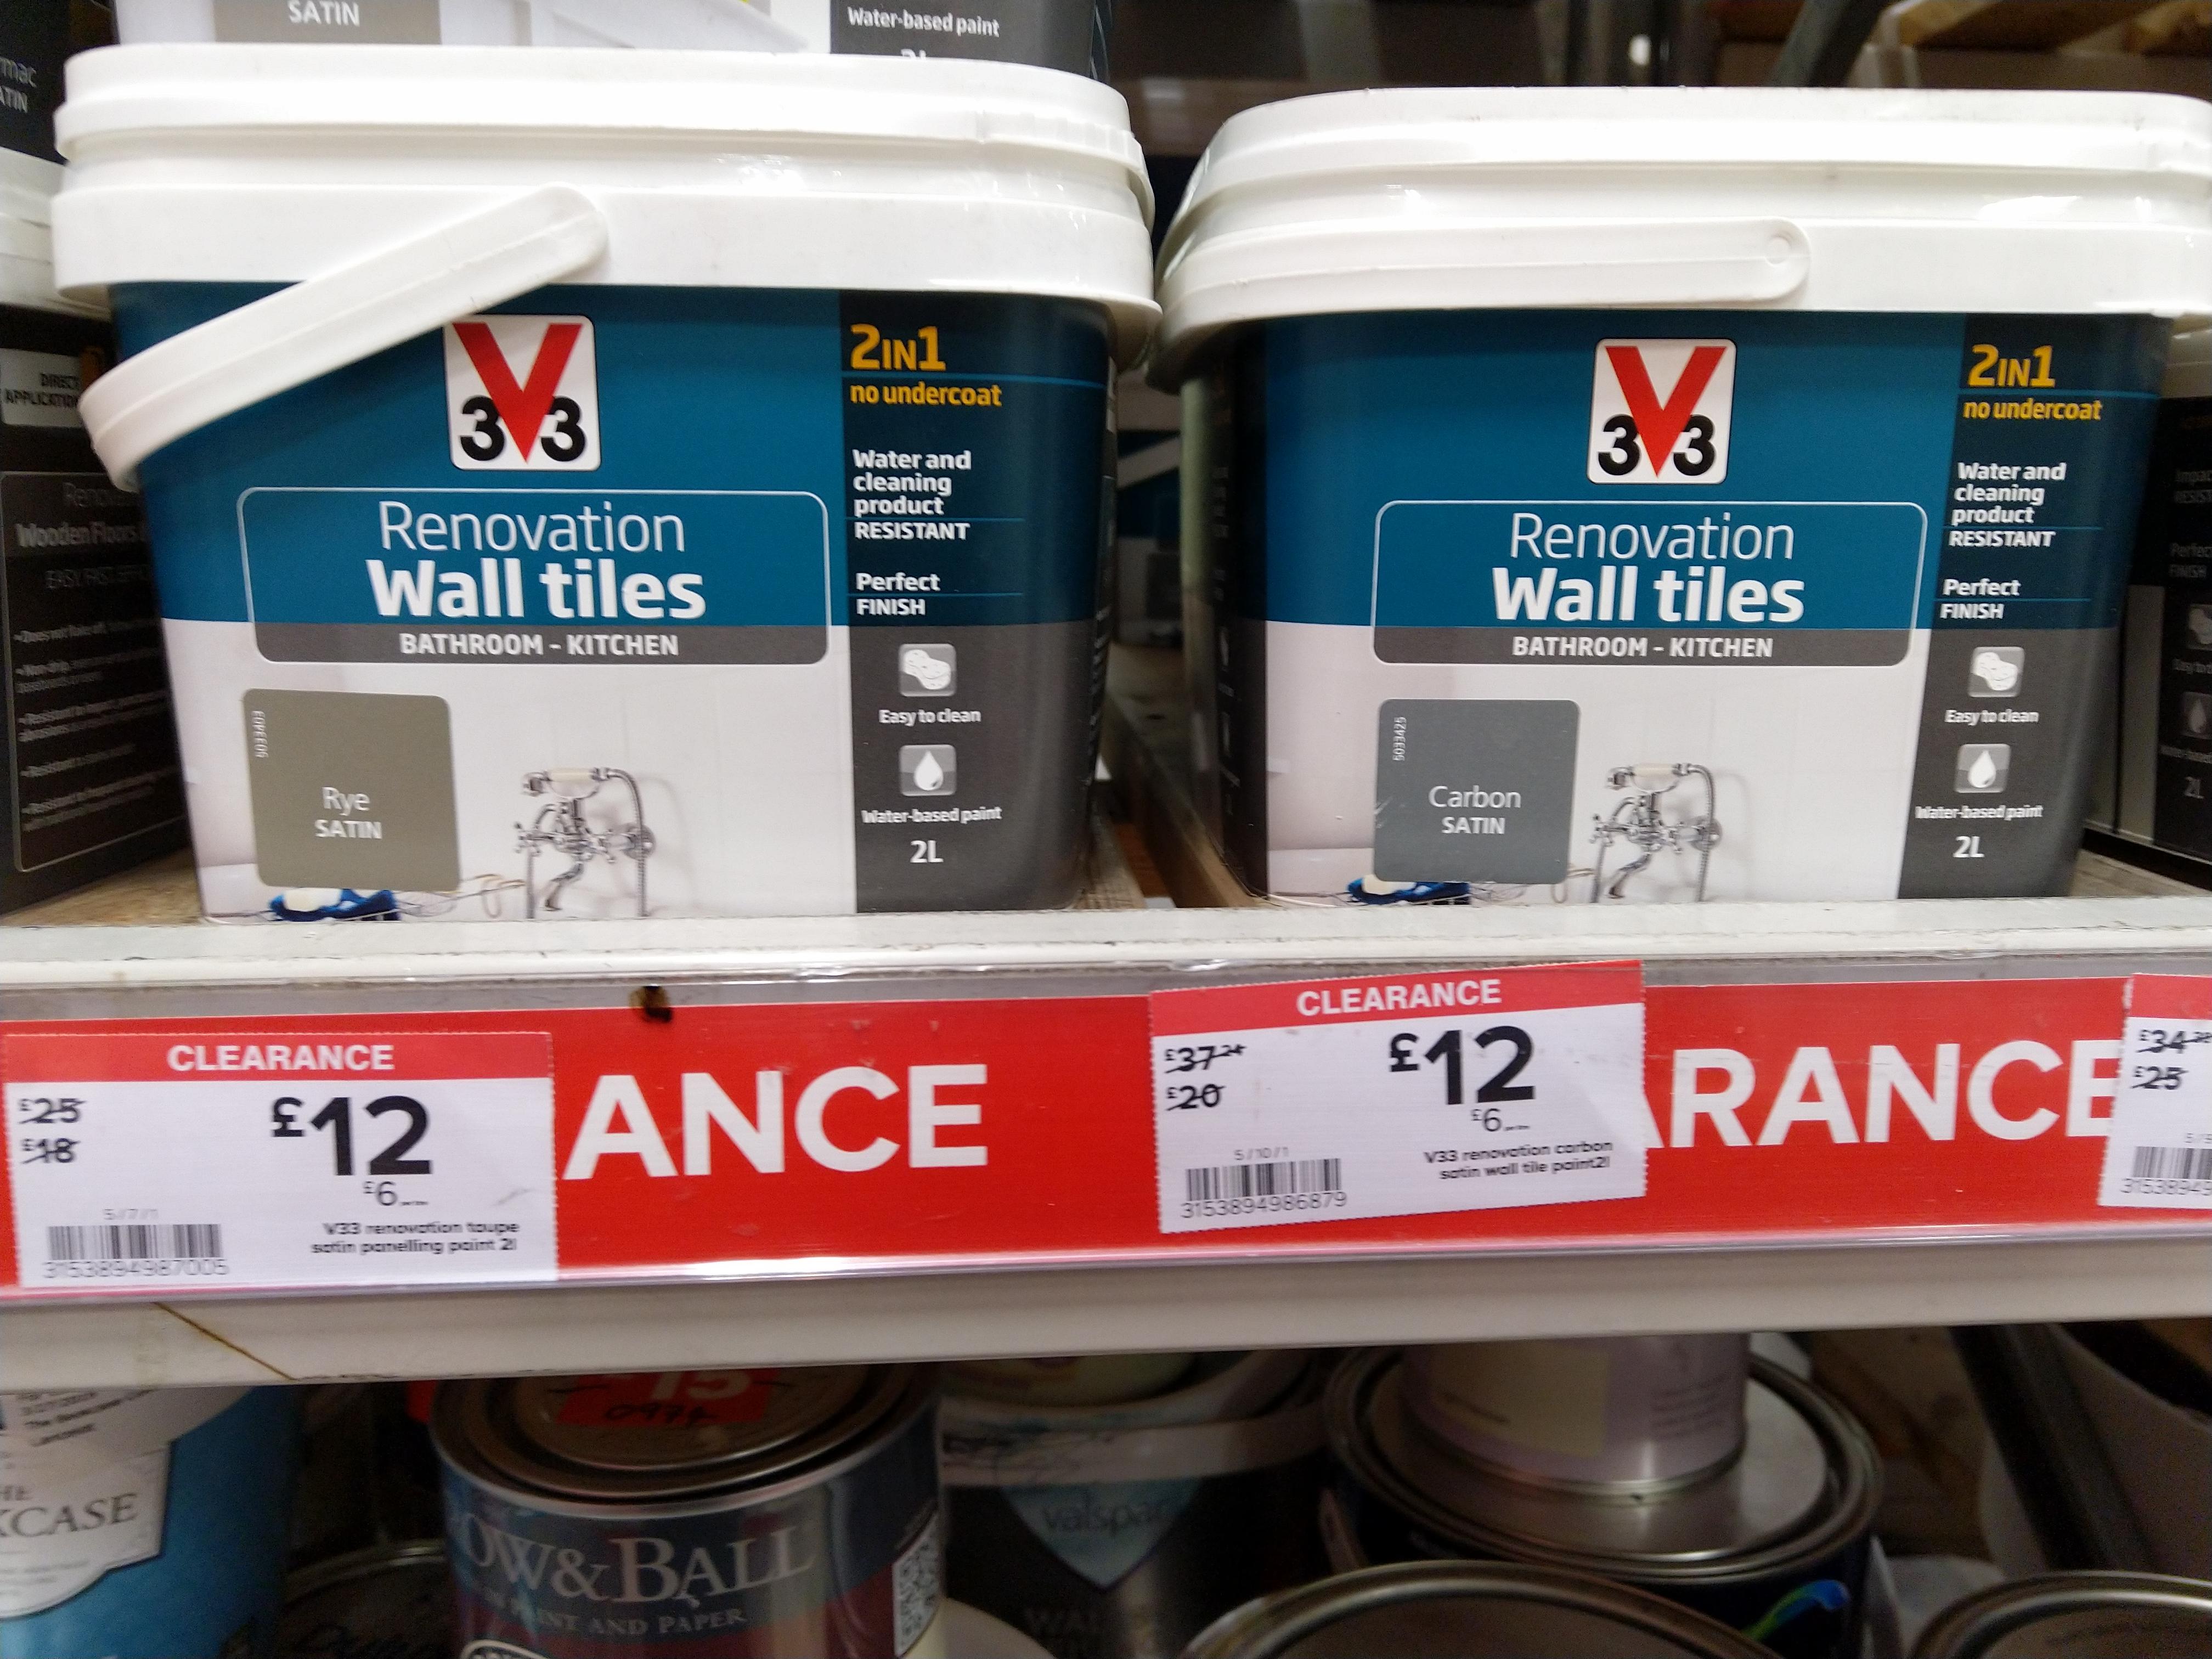 Remarkable V33 Bathroom Kitchen 2 Litre Tile Paint At Bq For 12 Home Interior And Landscaping Spoatsignezvosmurscom